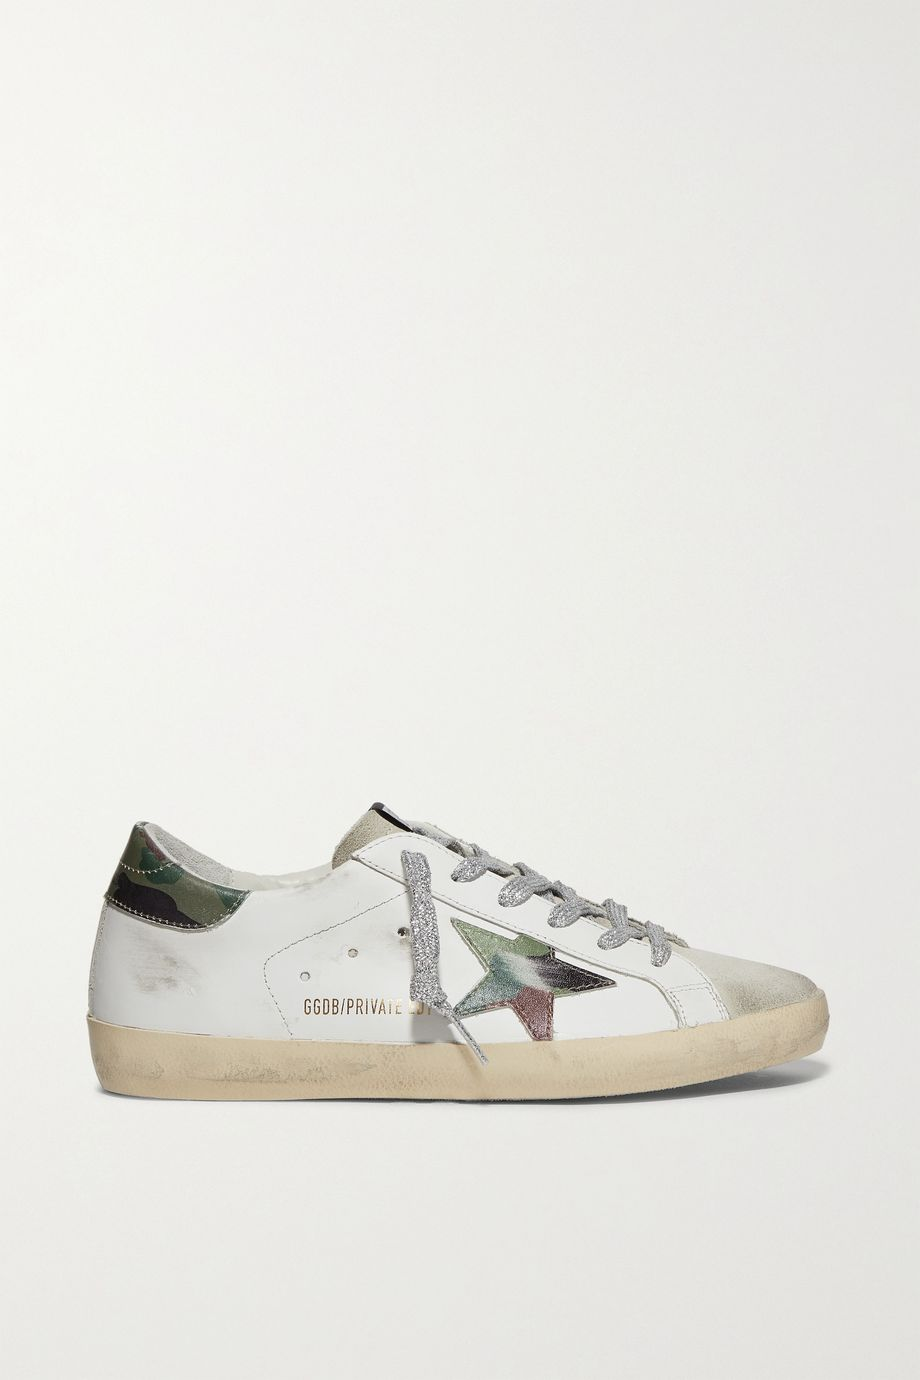 Golden Goose Superstar Sneakers aus Leder und Veloursleder mit Print in Distressed-Optik